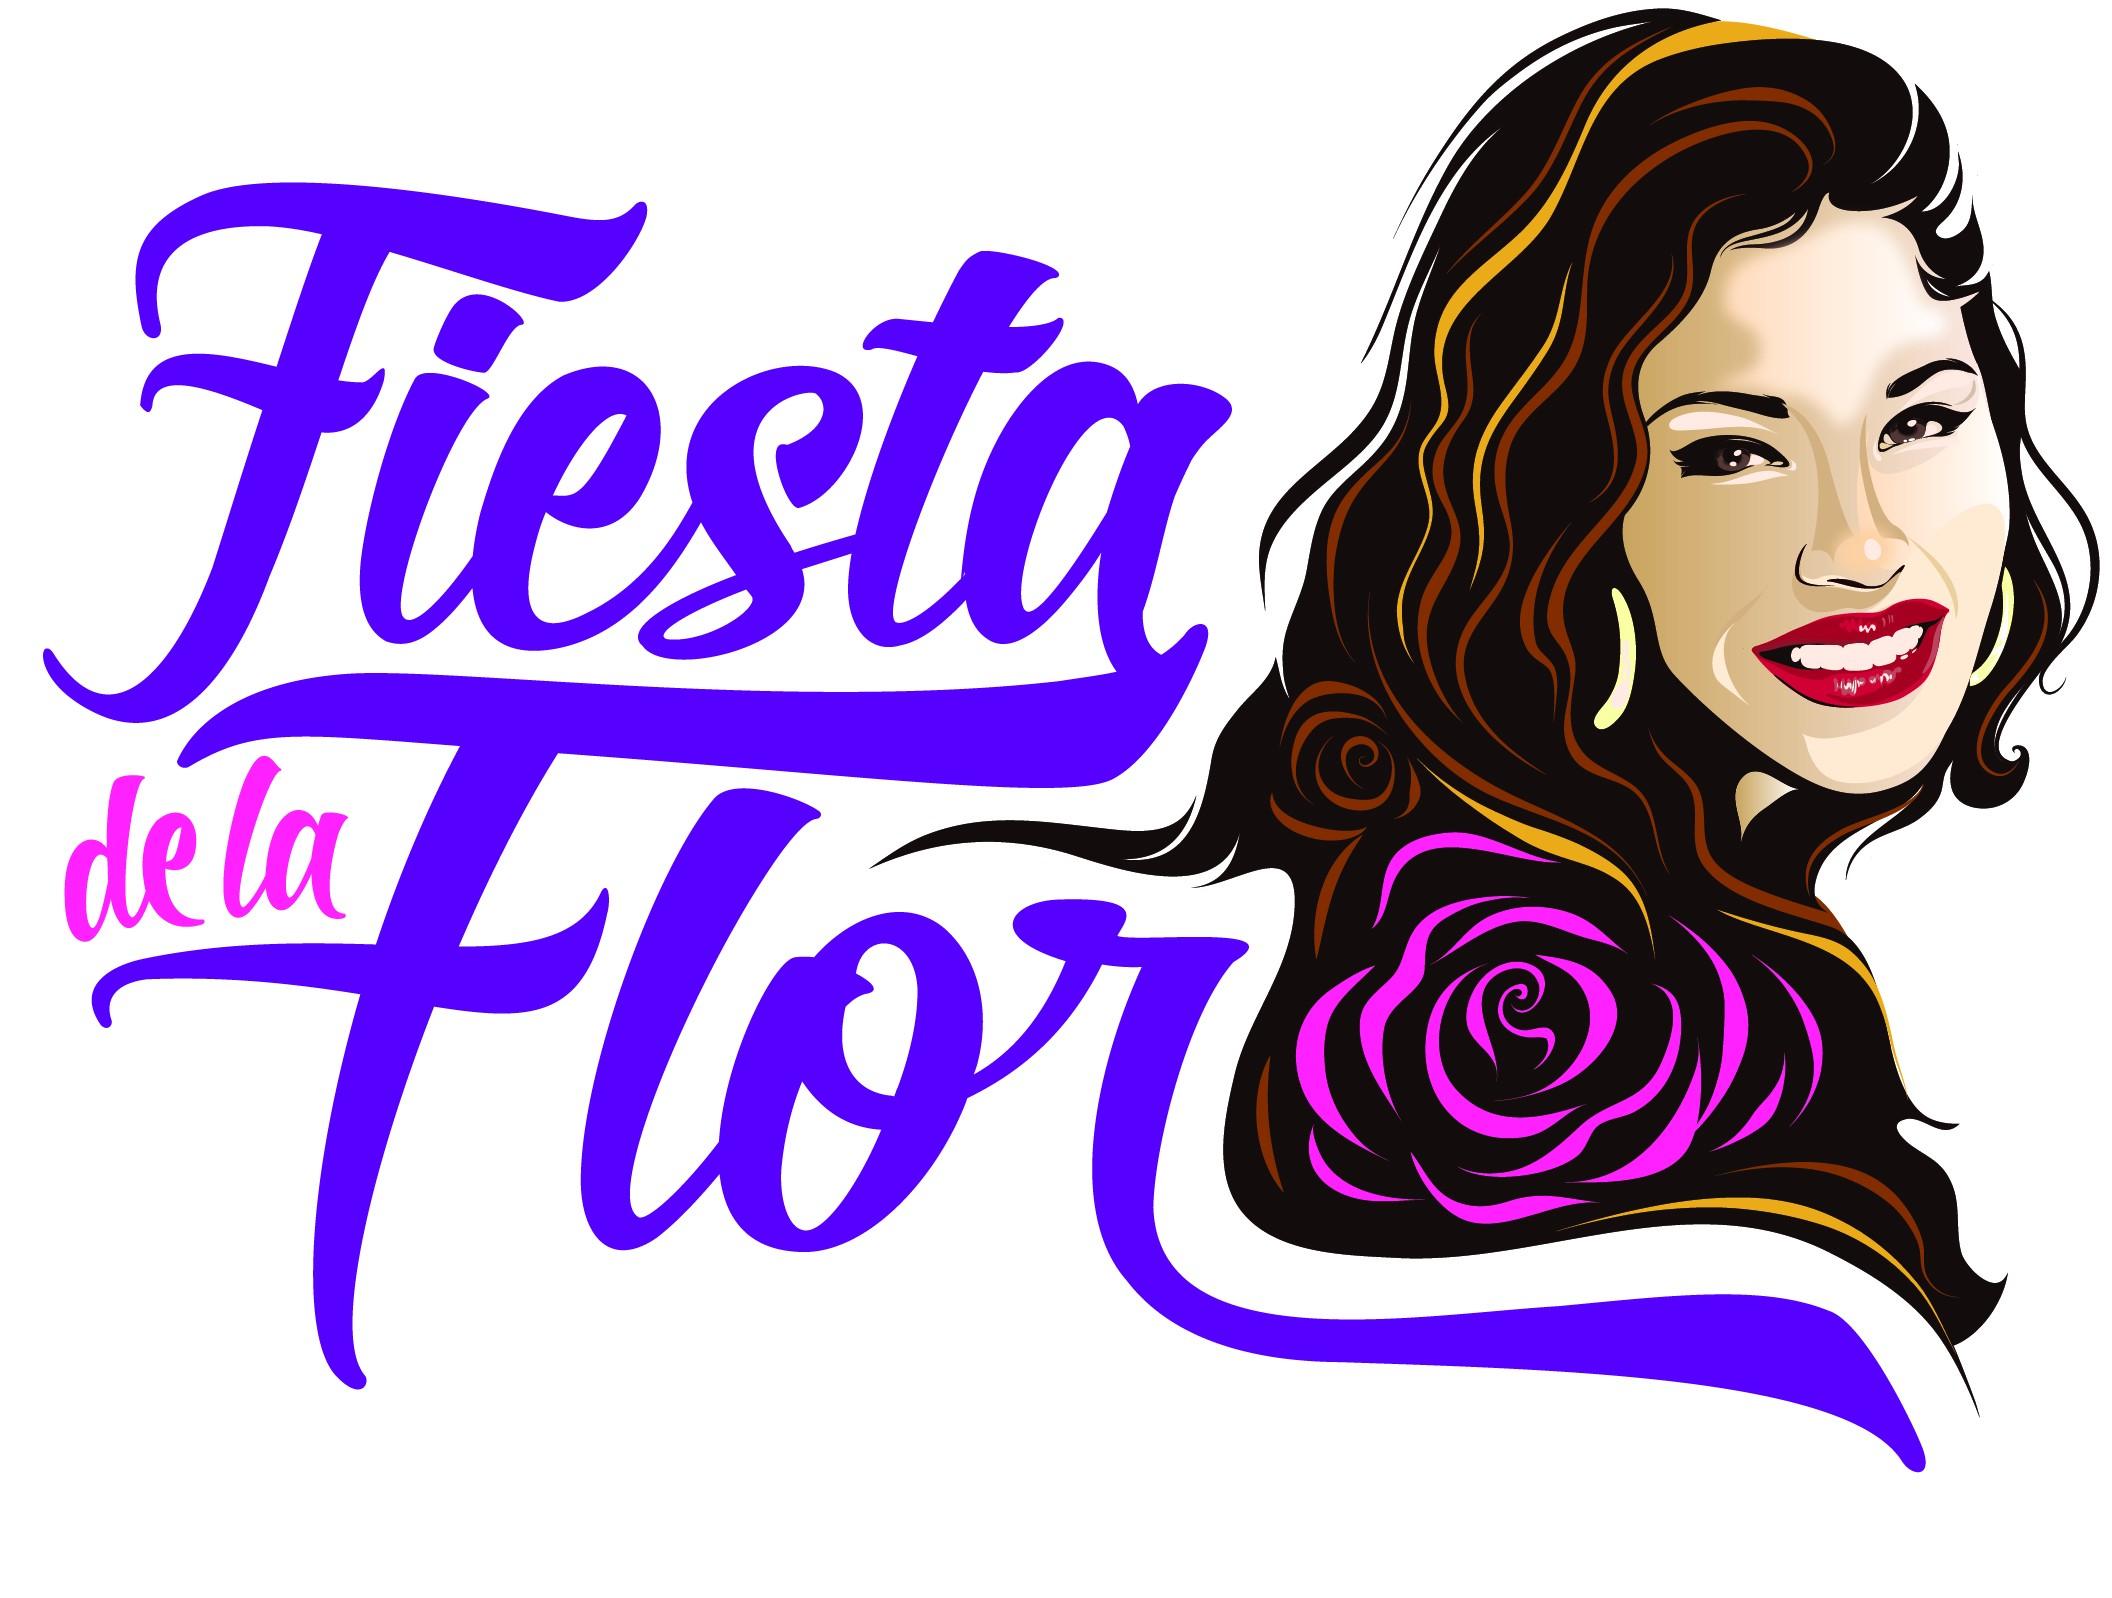 Rain Didn't Stop Selena Fans at First Flower Festival - NBC News